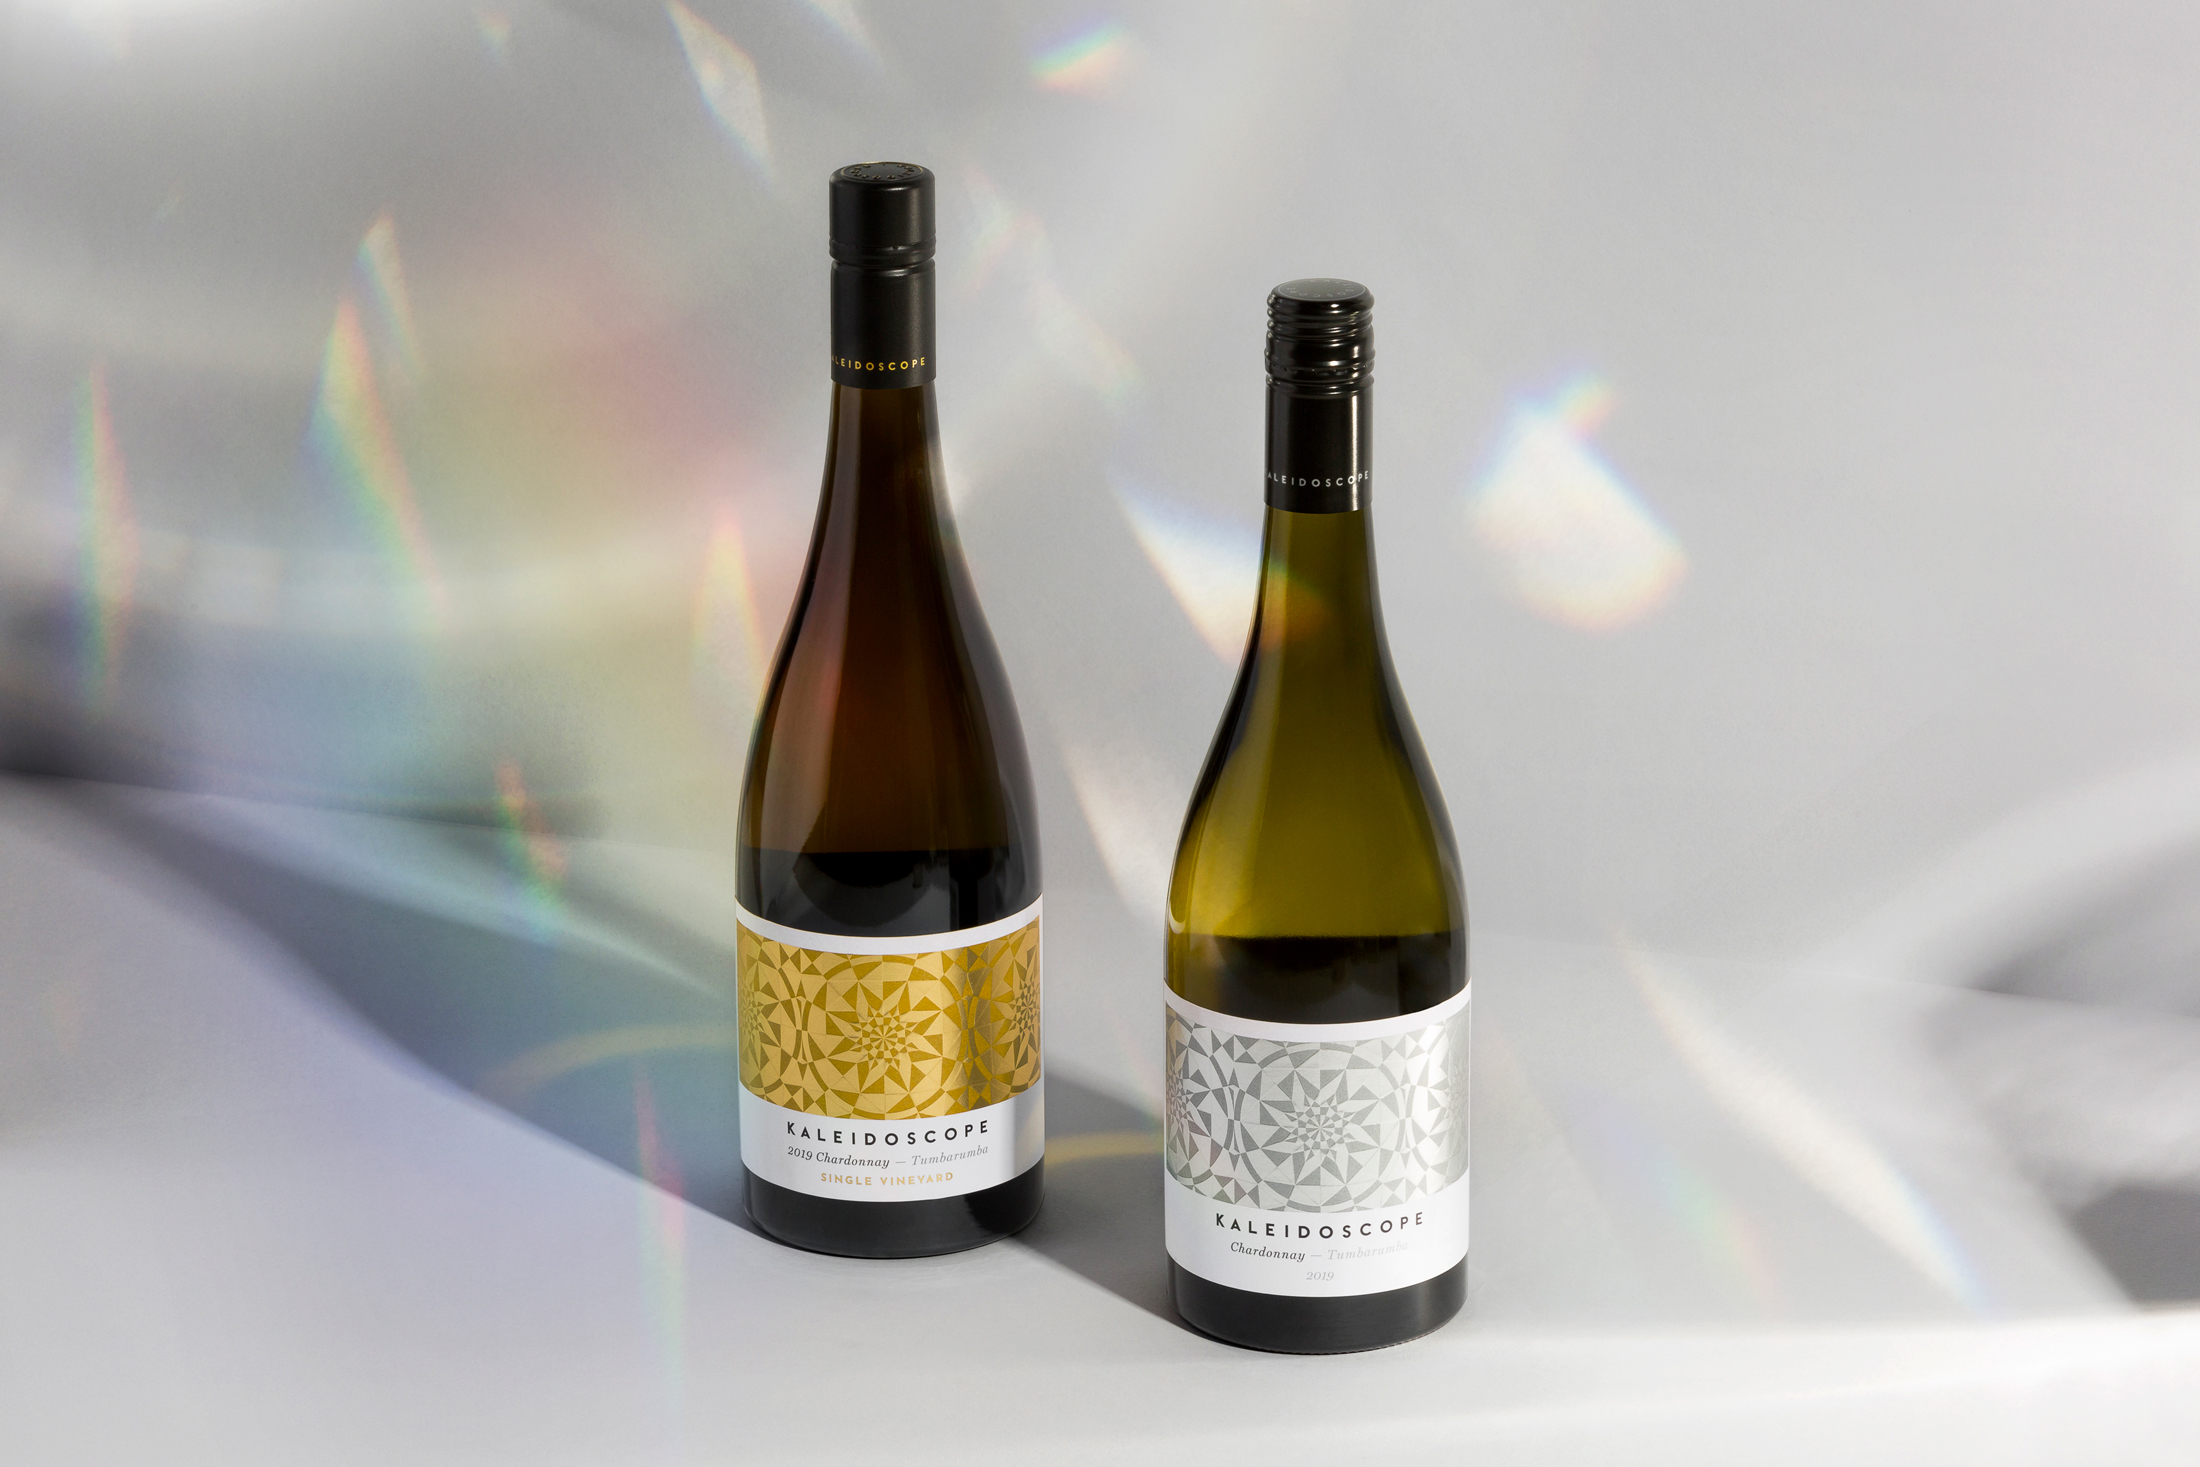 David Byerlee Design Creates Label Design for Kaleidoscope Wines